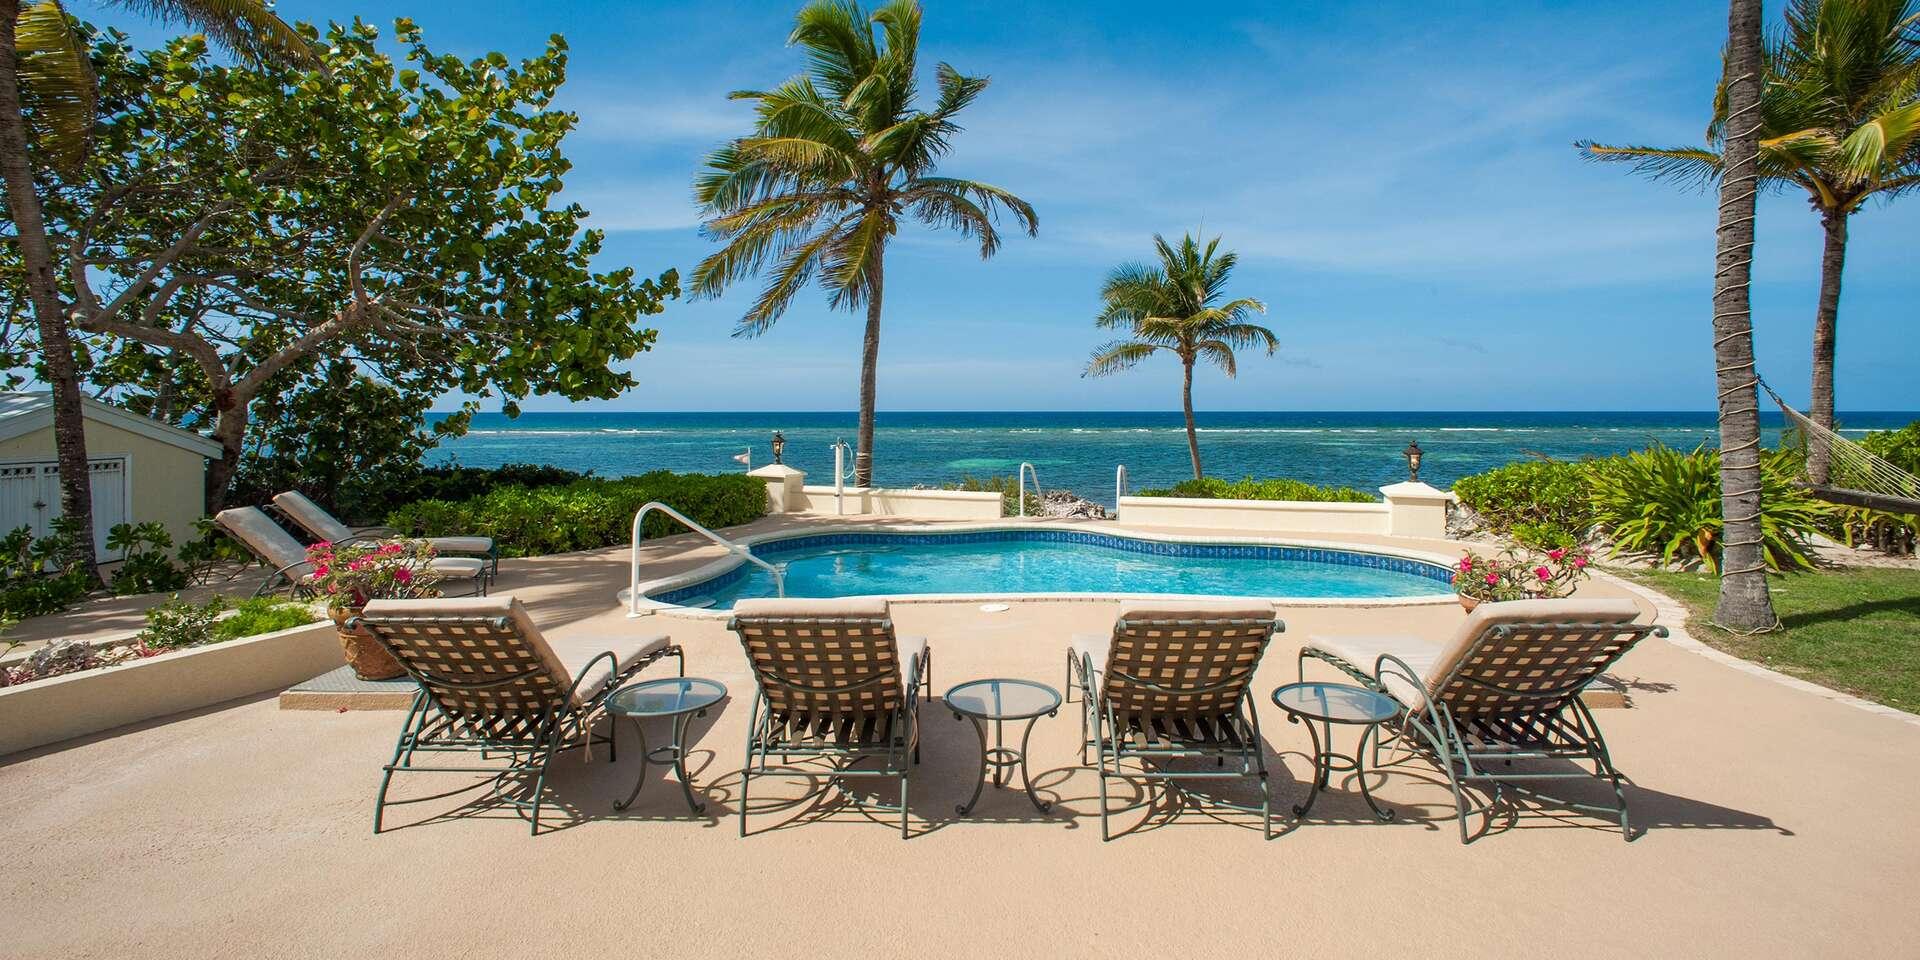 Luxury villa rentals caribbean - Cayman islands - Grand cayman - Rum point - Gypsy - Image 1/22